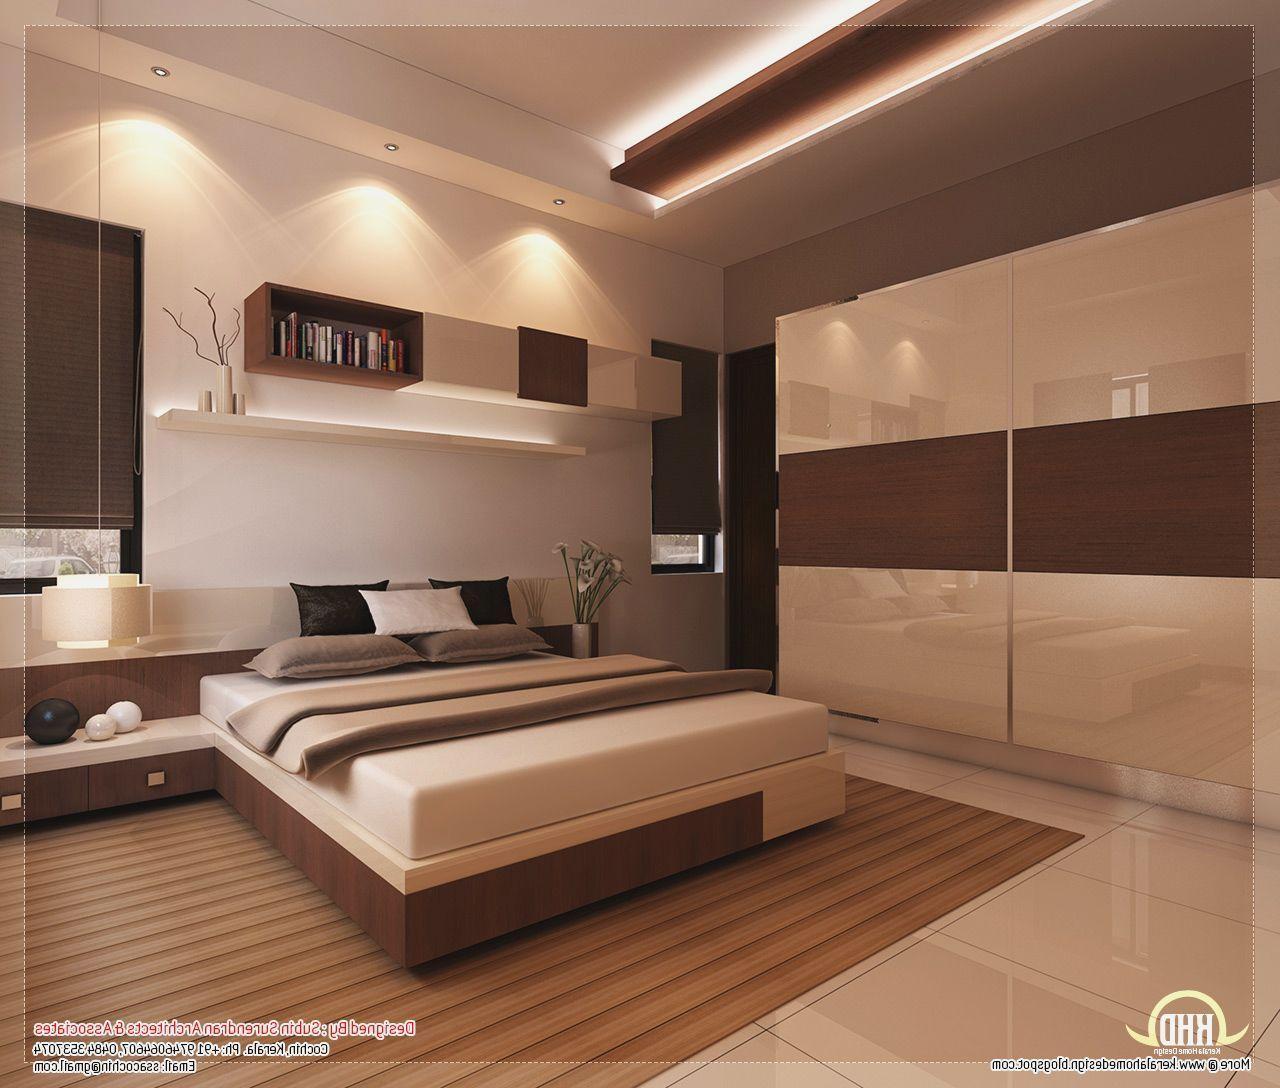 Low Budget Bedroom Interior Design In India Ide Kamar Tidur Interior Kamar Utama